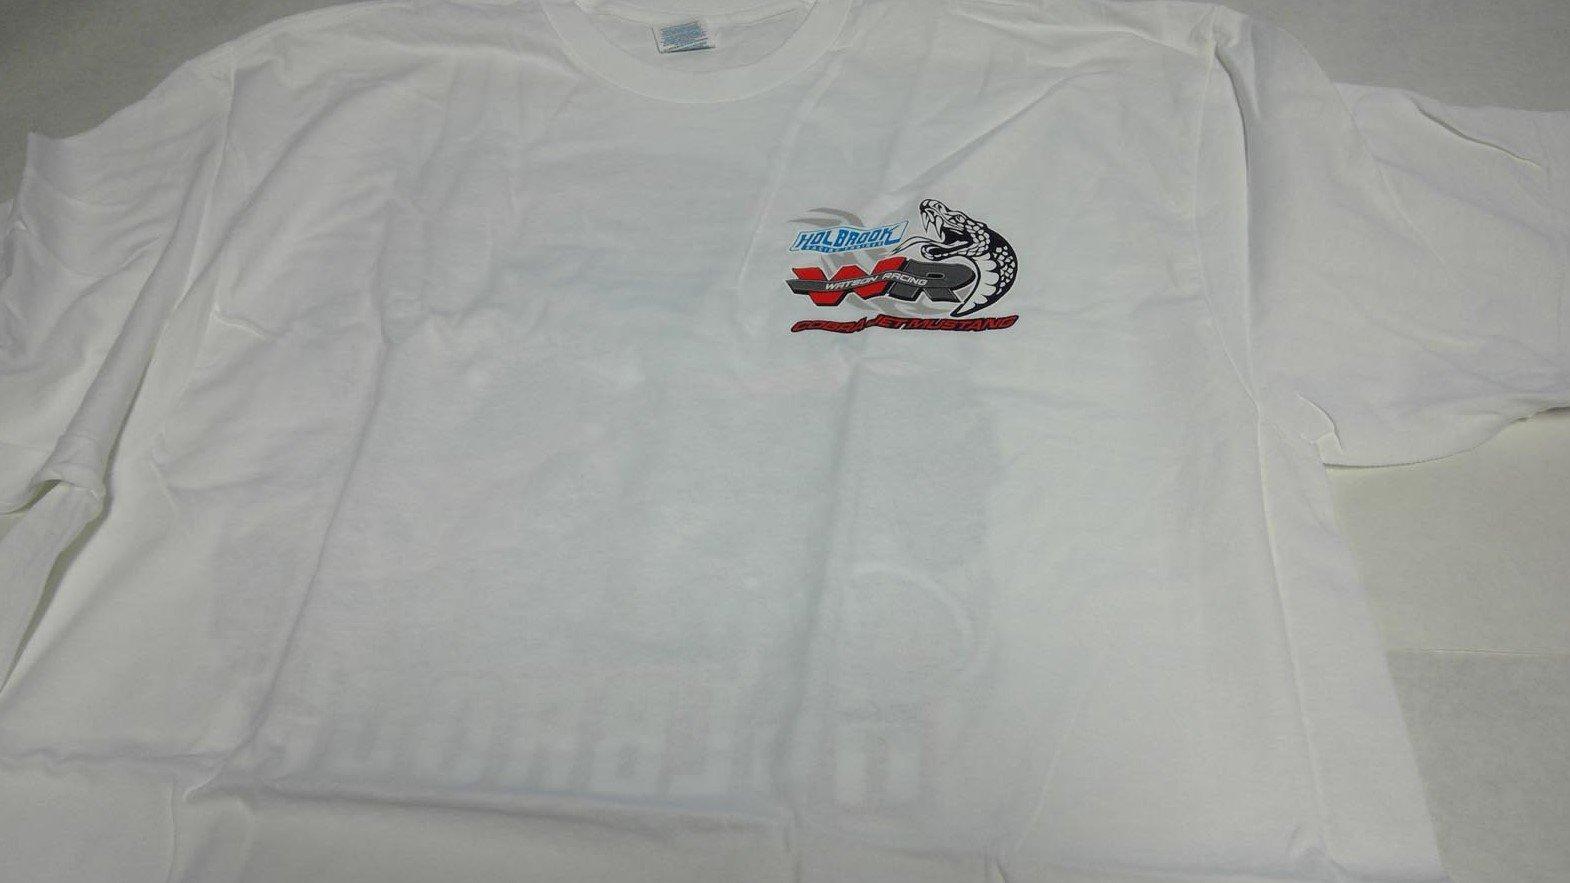 Super Stocker Shirts